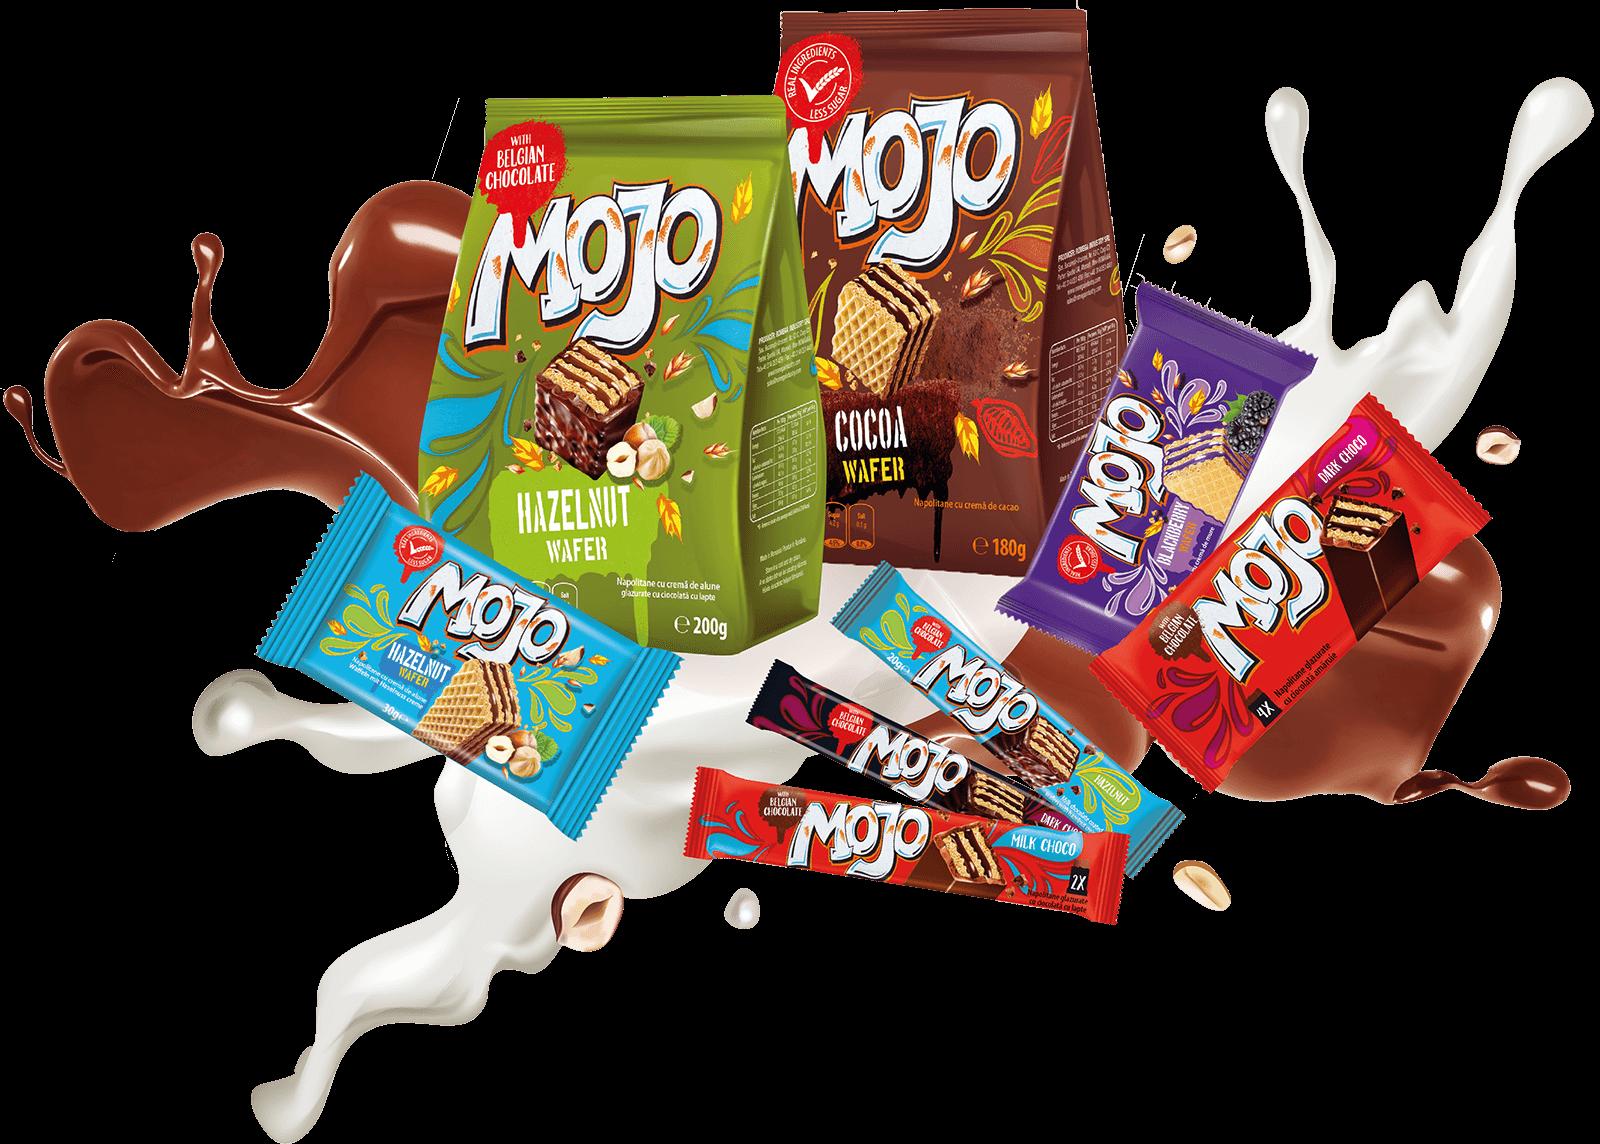 mojo product series